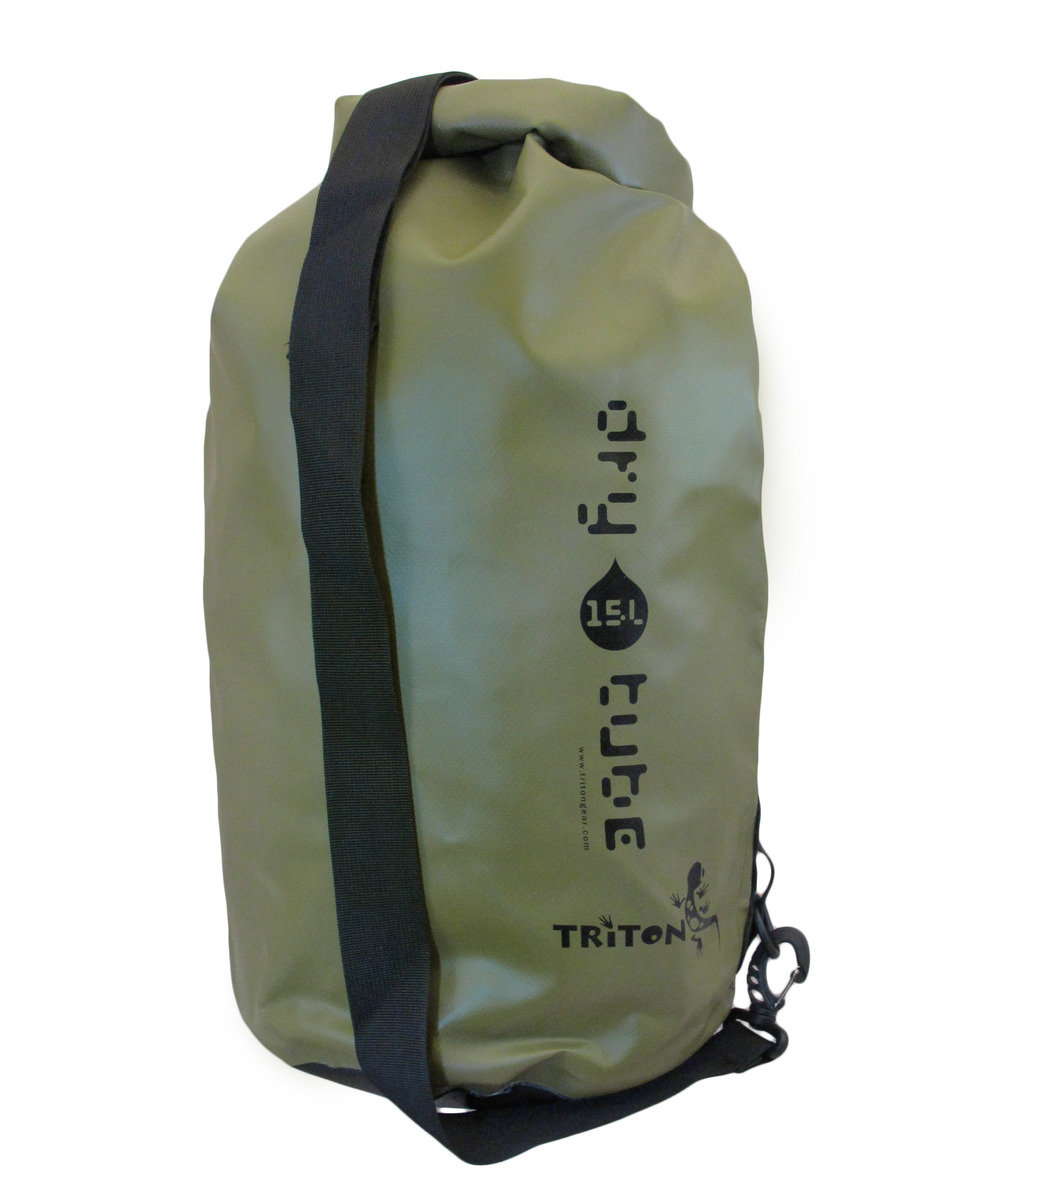 Triton 隨身優質防水袋 Dry Tube 15L olive